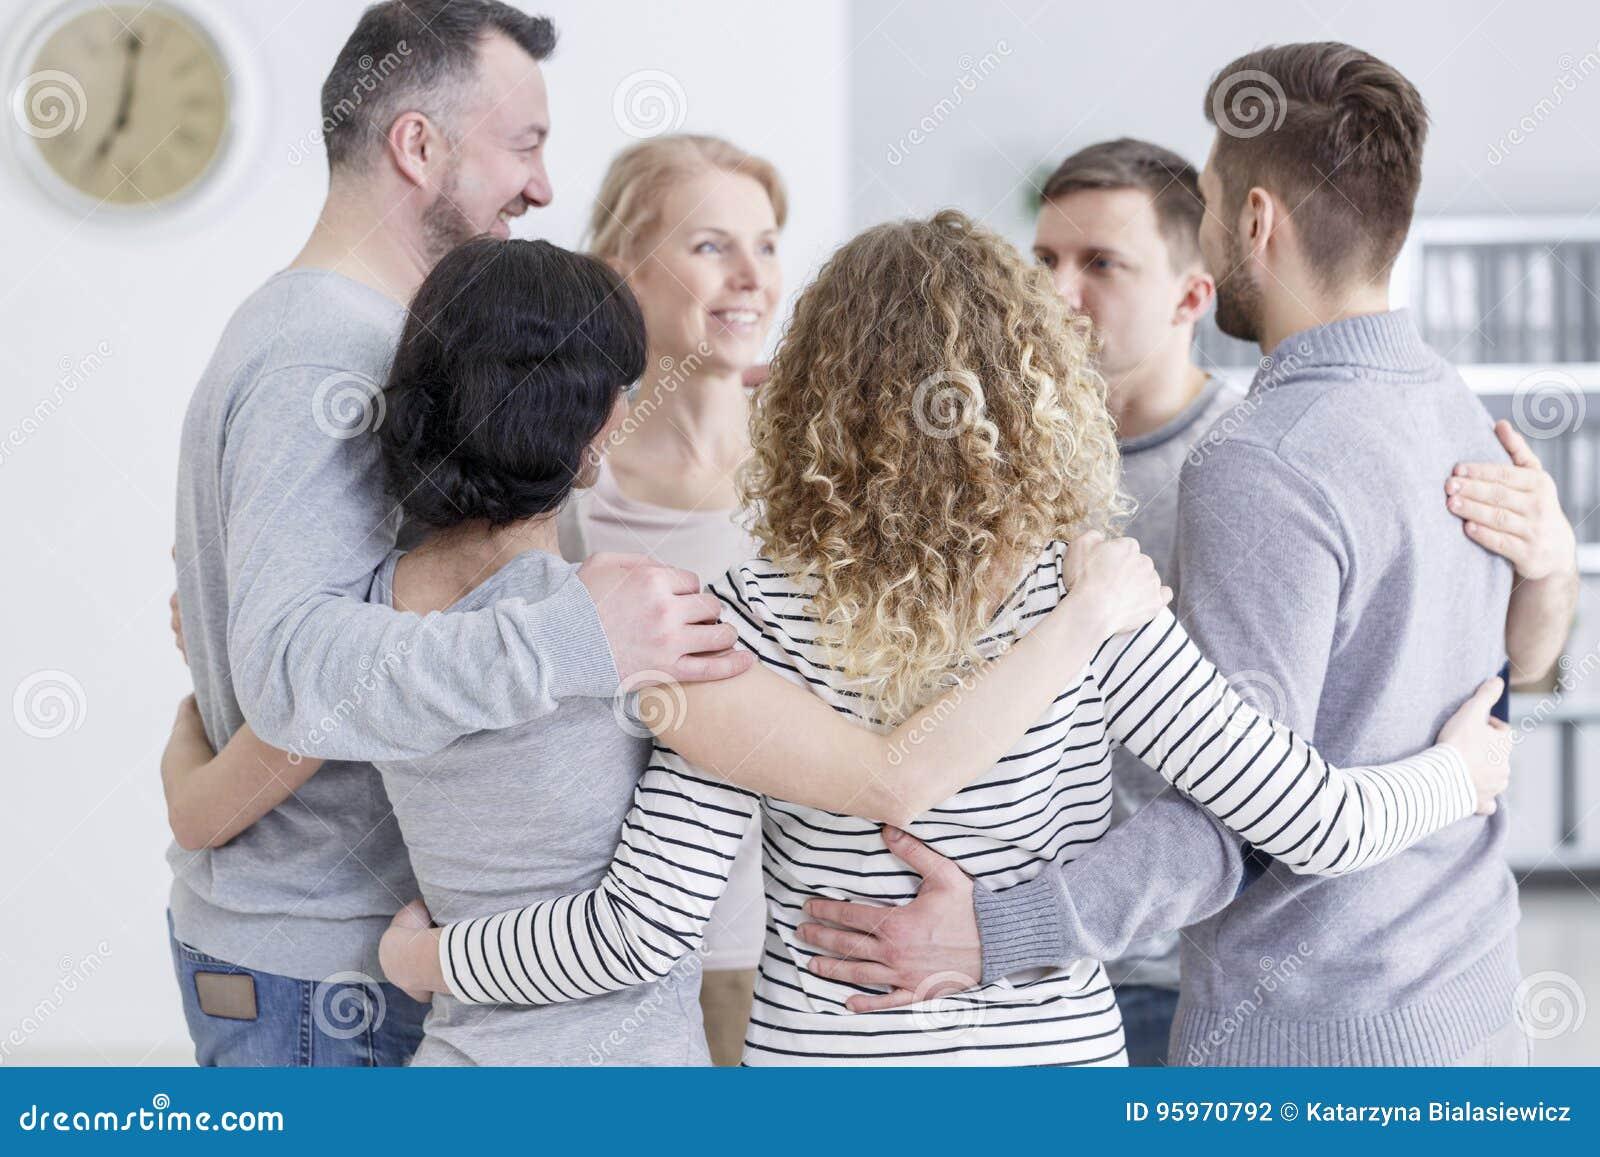 Abraço do grupo durante a terapia